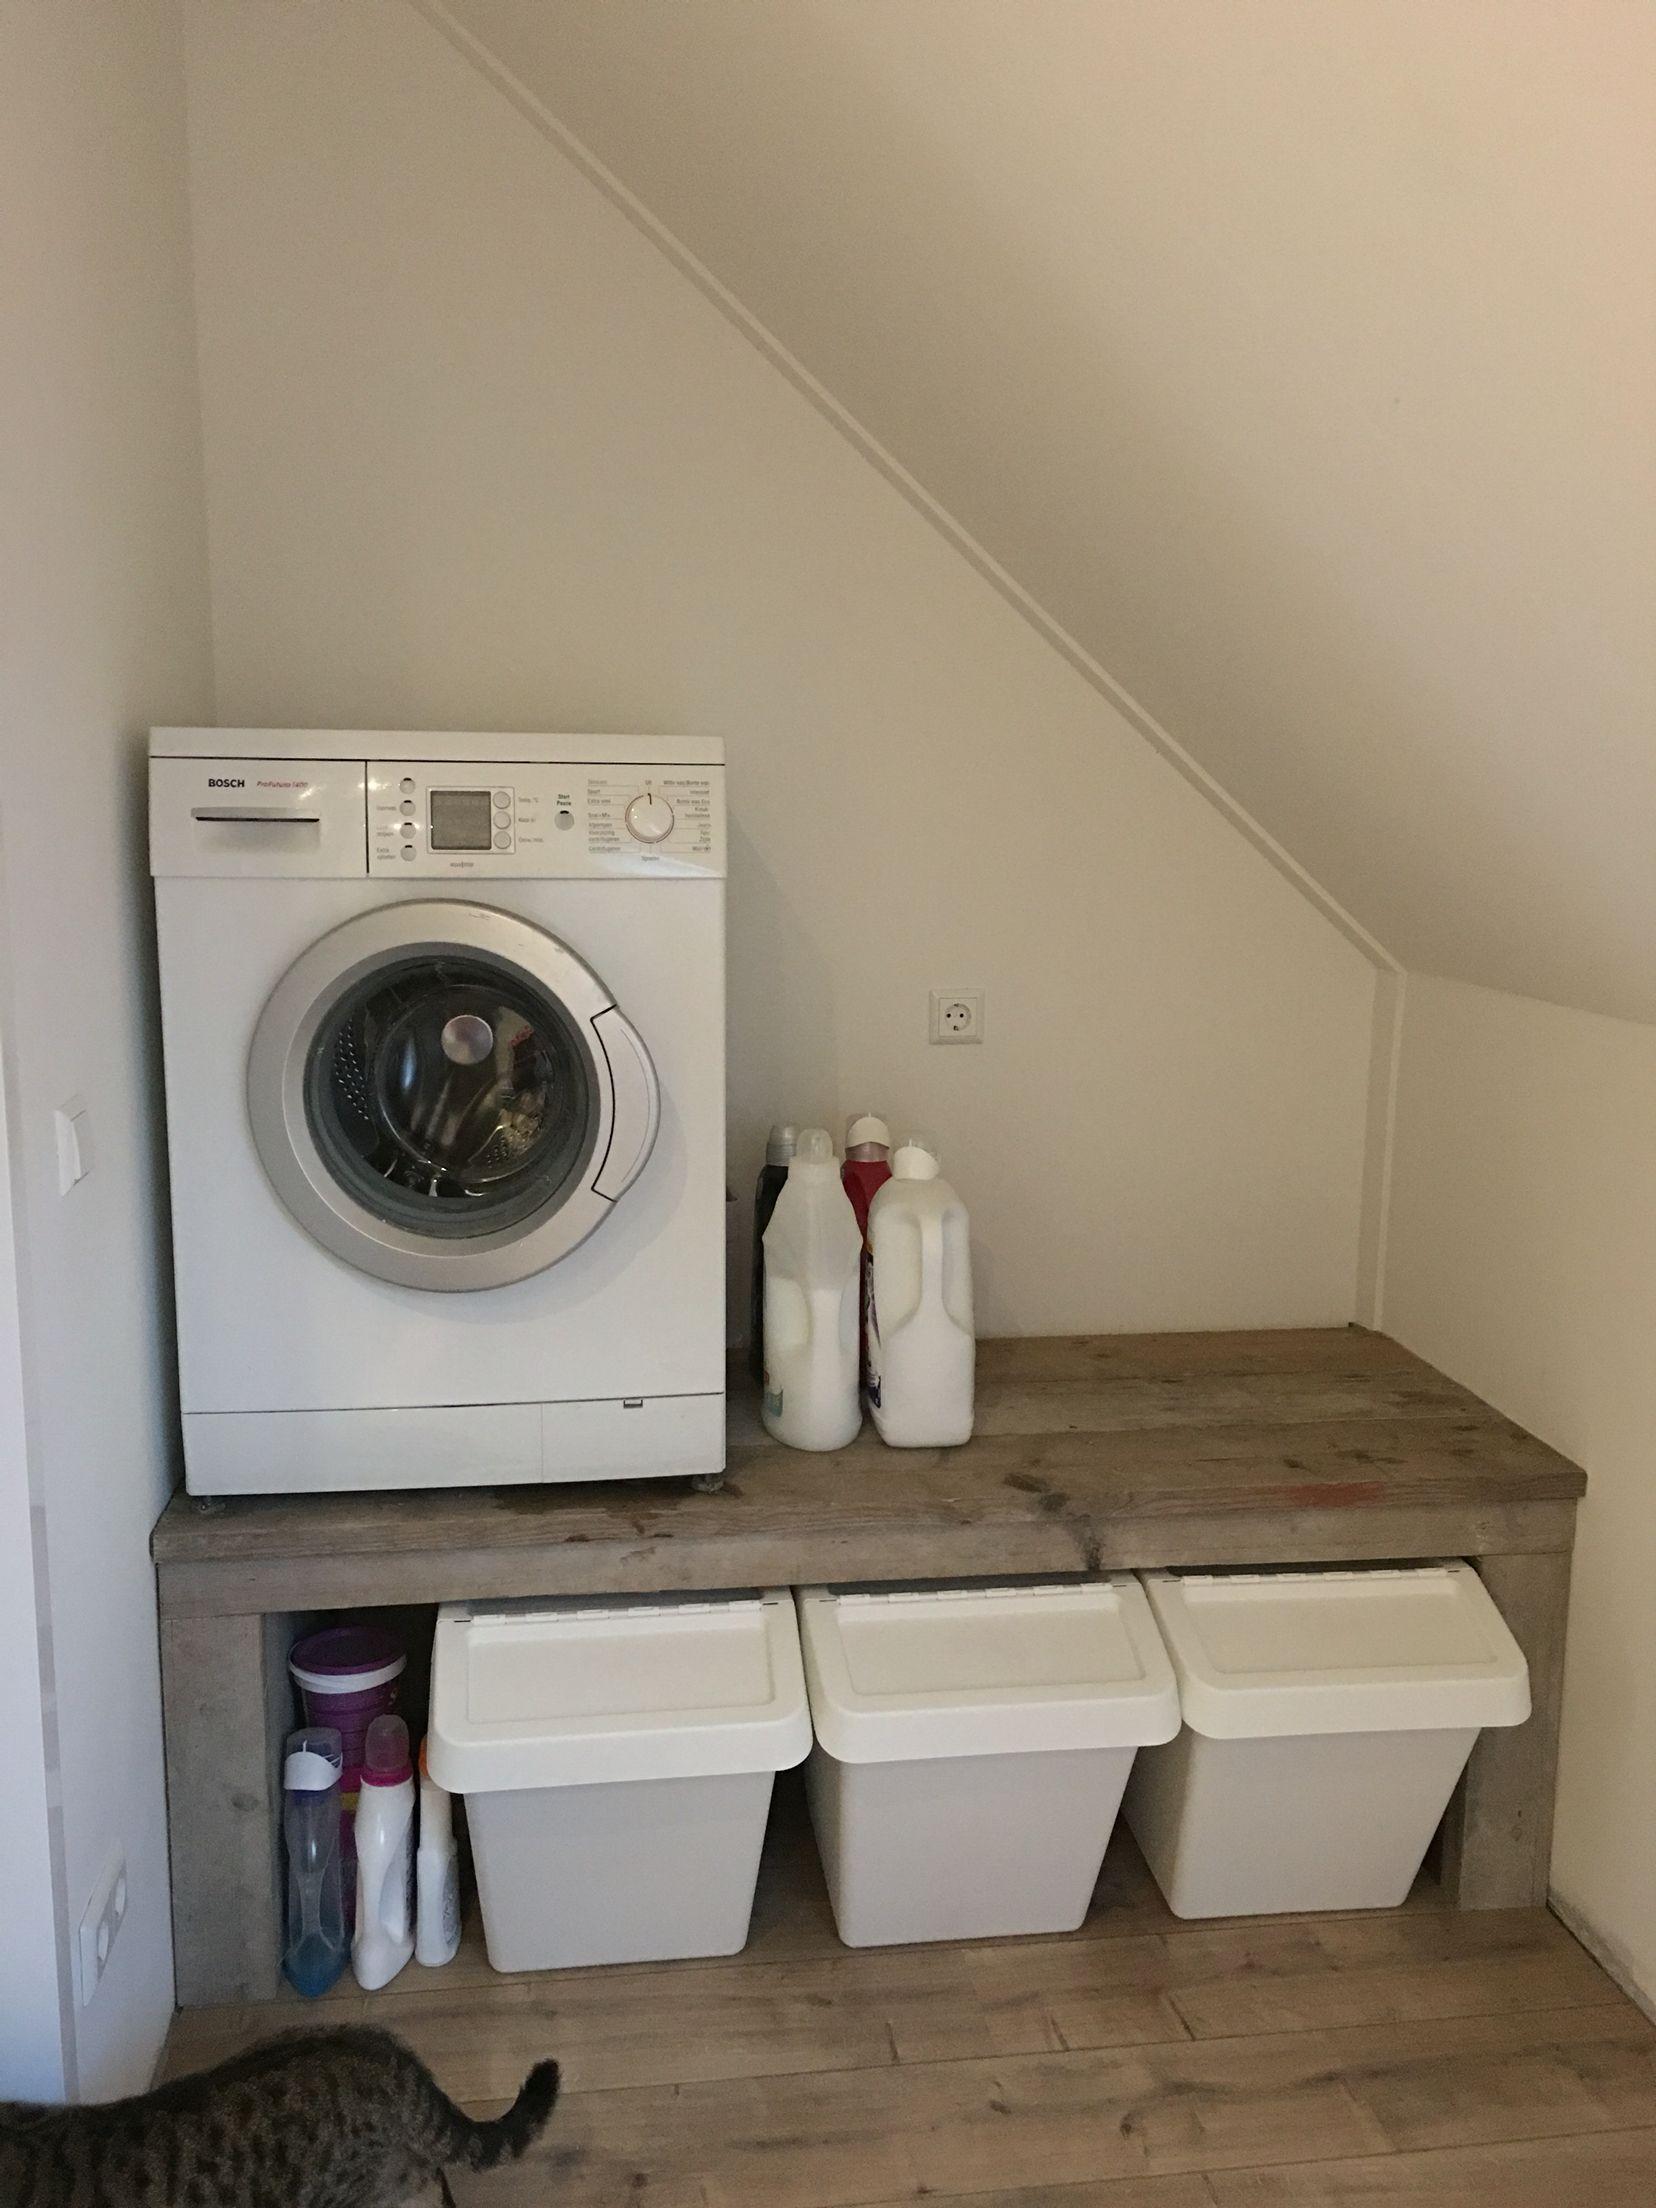 mooie wasmachine/droger verhoging van steigerhout gemaakt door m'n